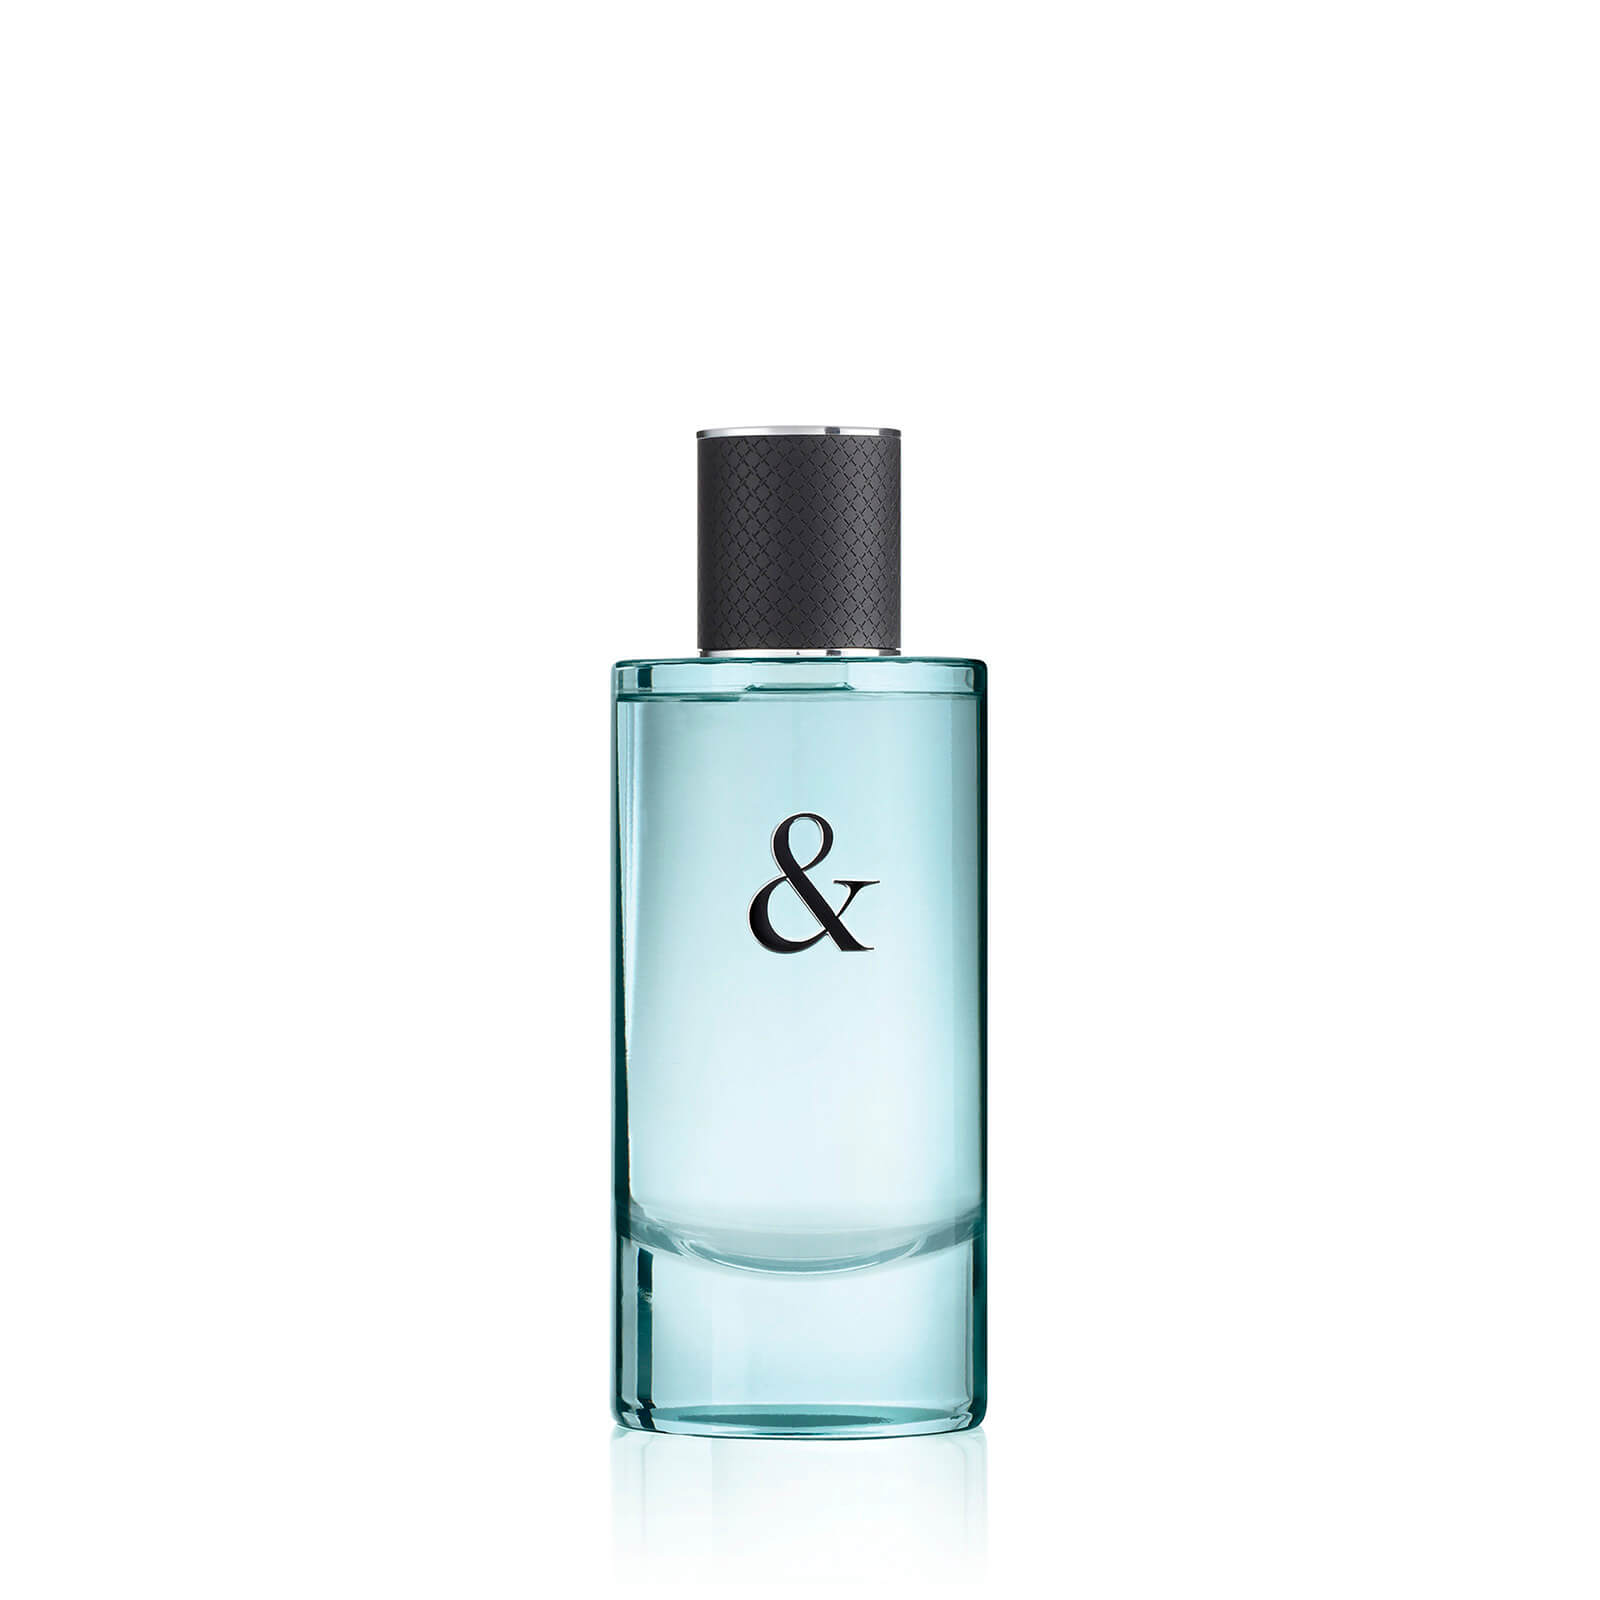 Tiffany & Co. & Love for Him Eau de Toilette 90ml